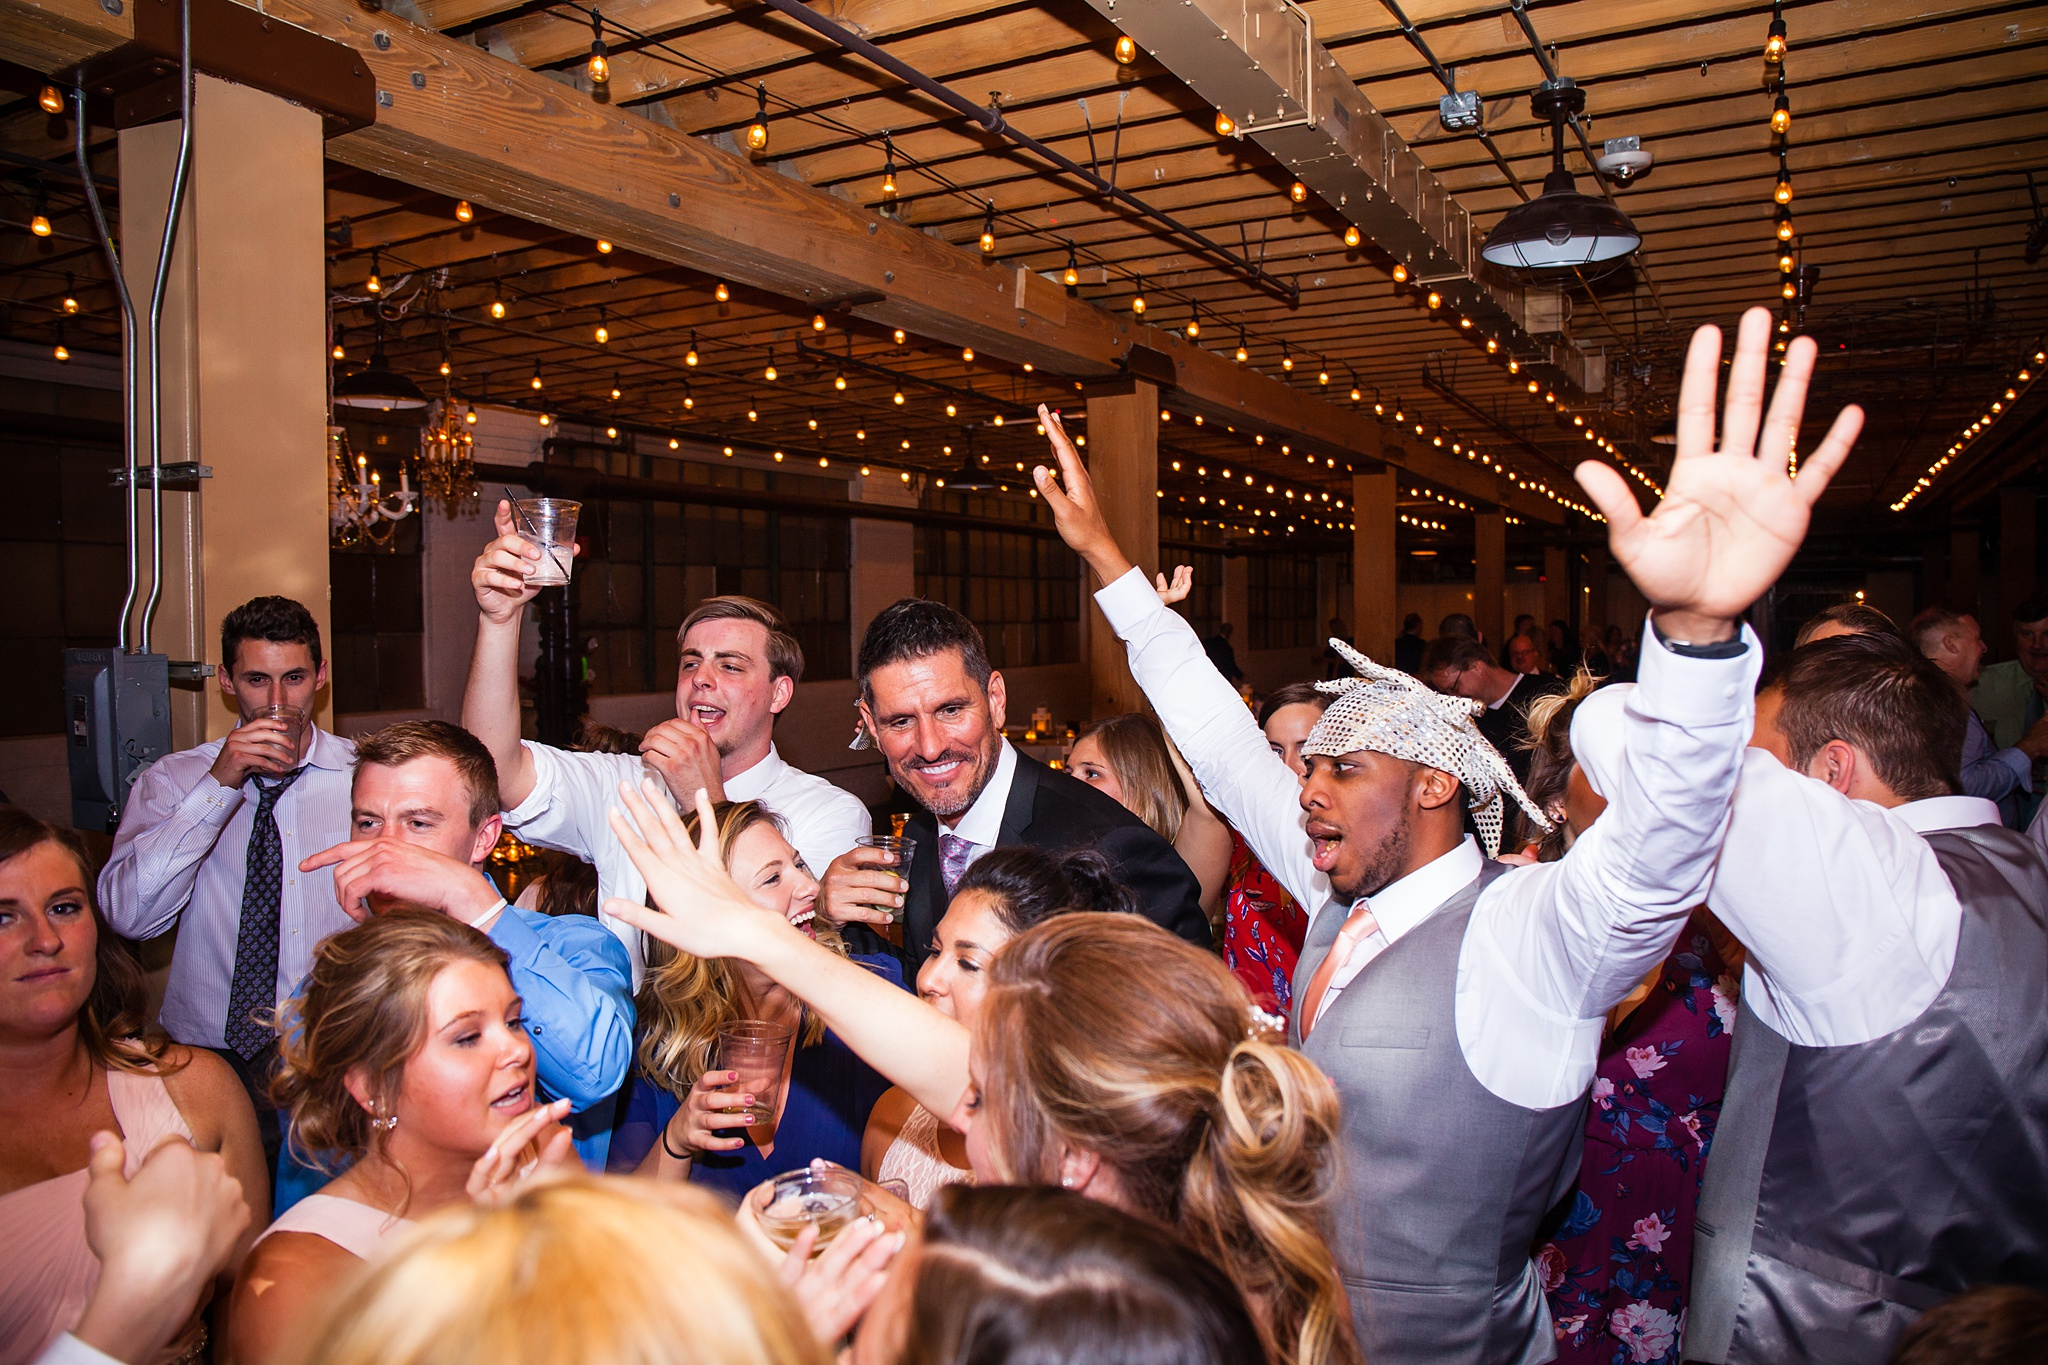 Meghan_Drew_Grand_Rapids_Cheney_place_Wedding098.JPG